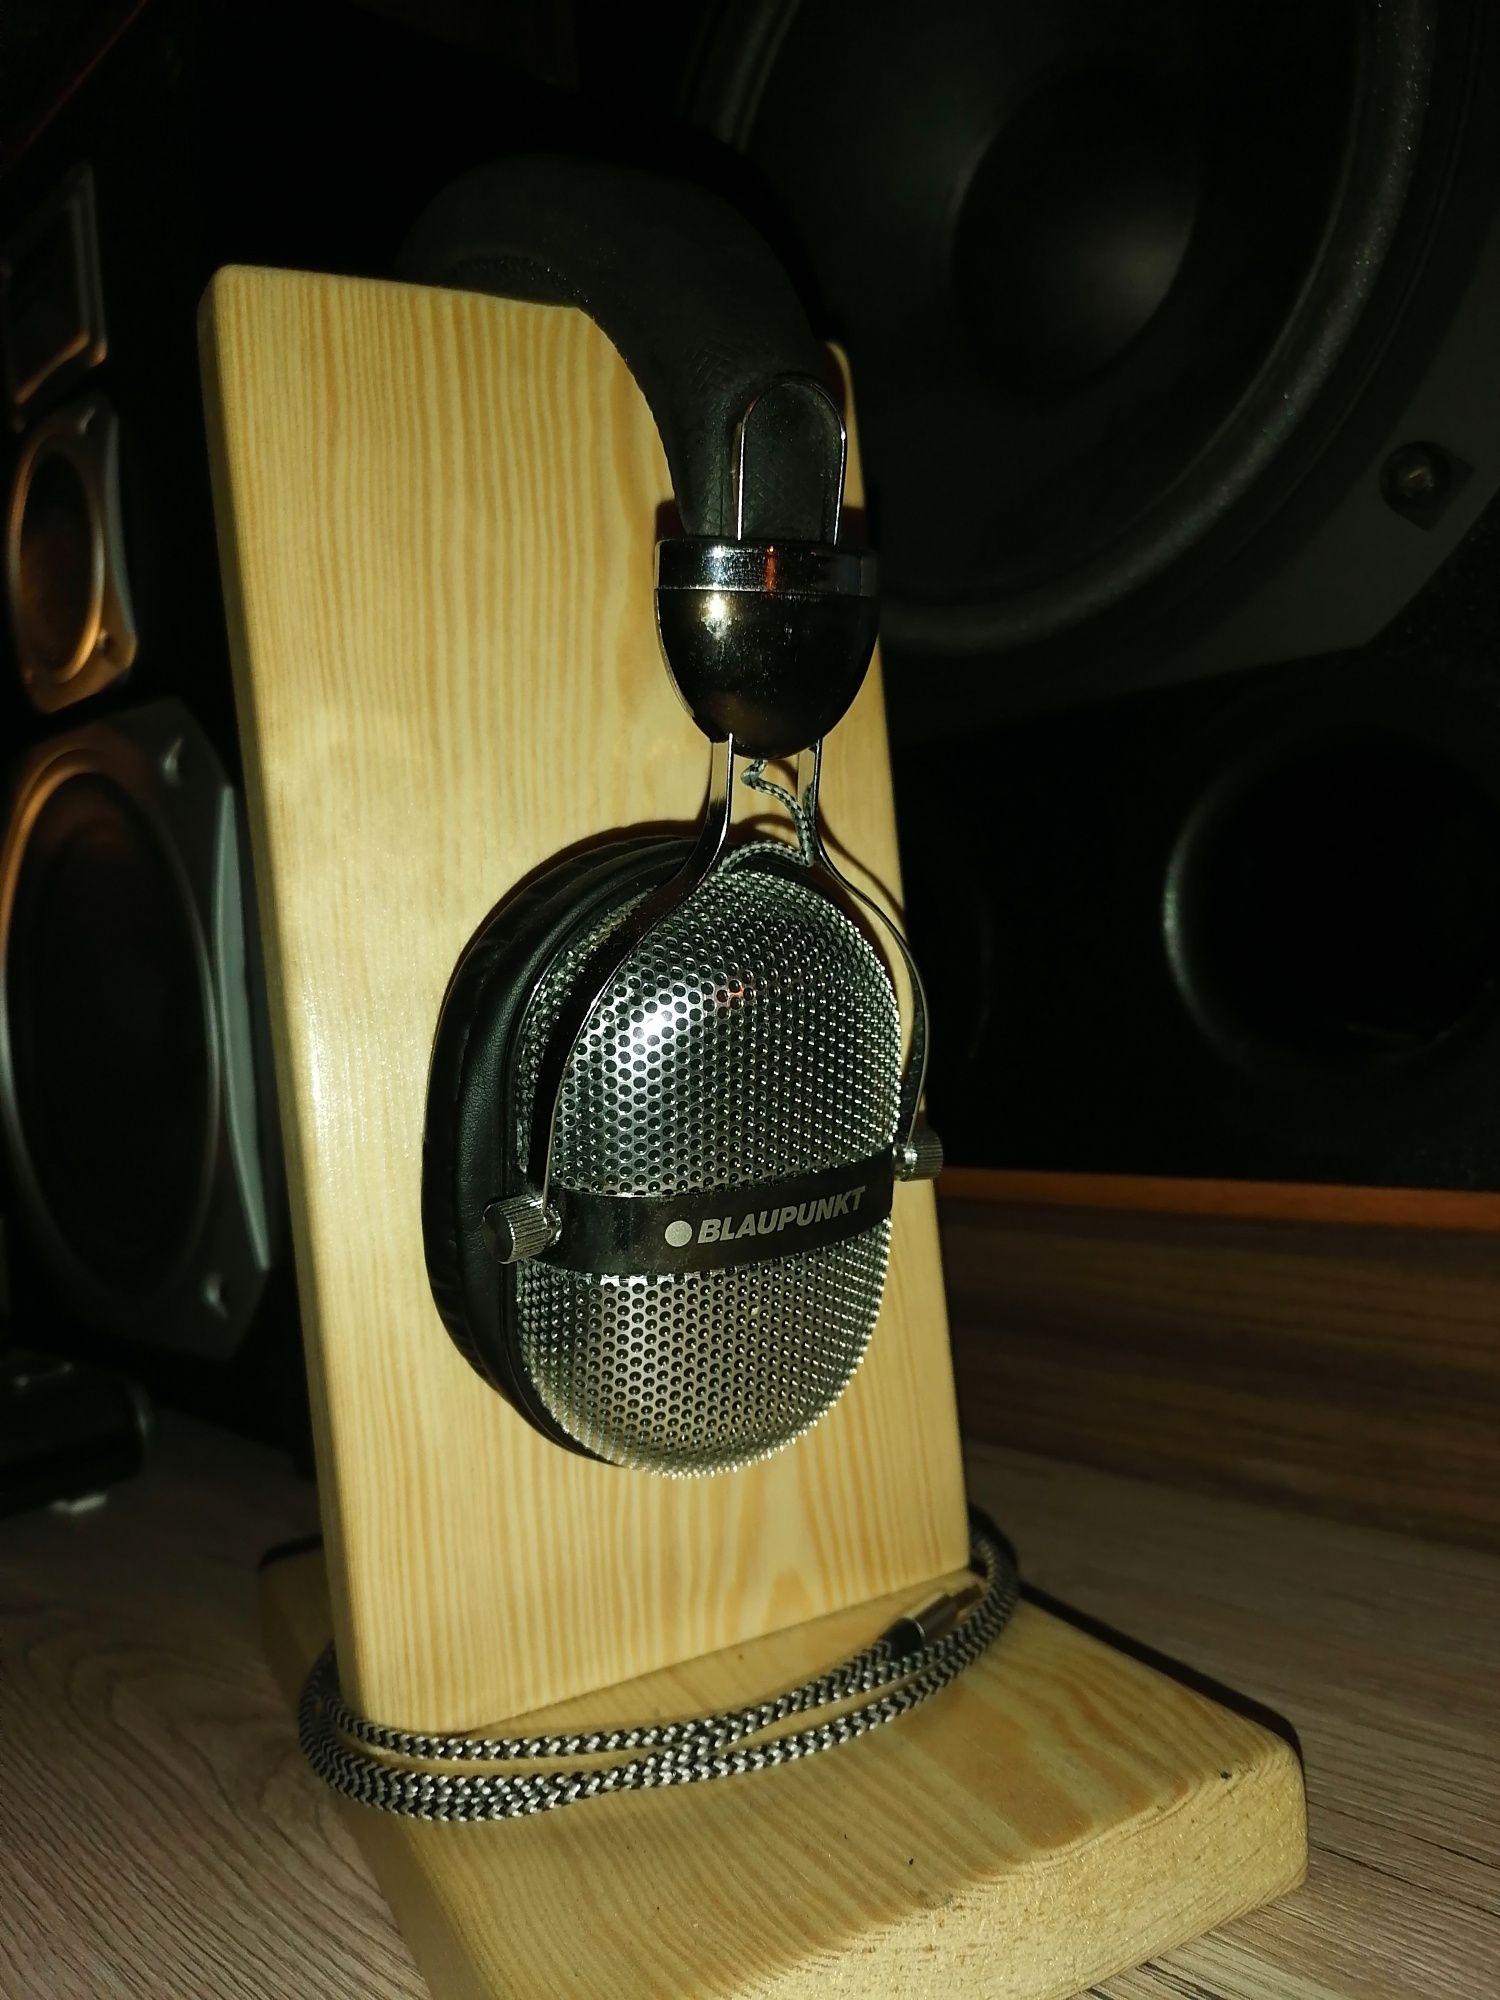 Słuchawki vintage blaupunkt